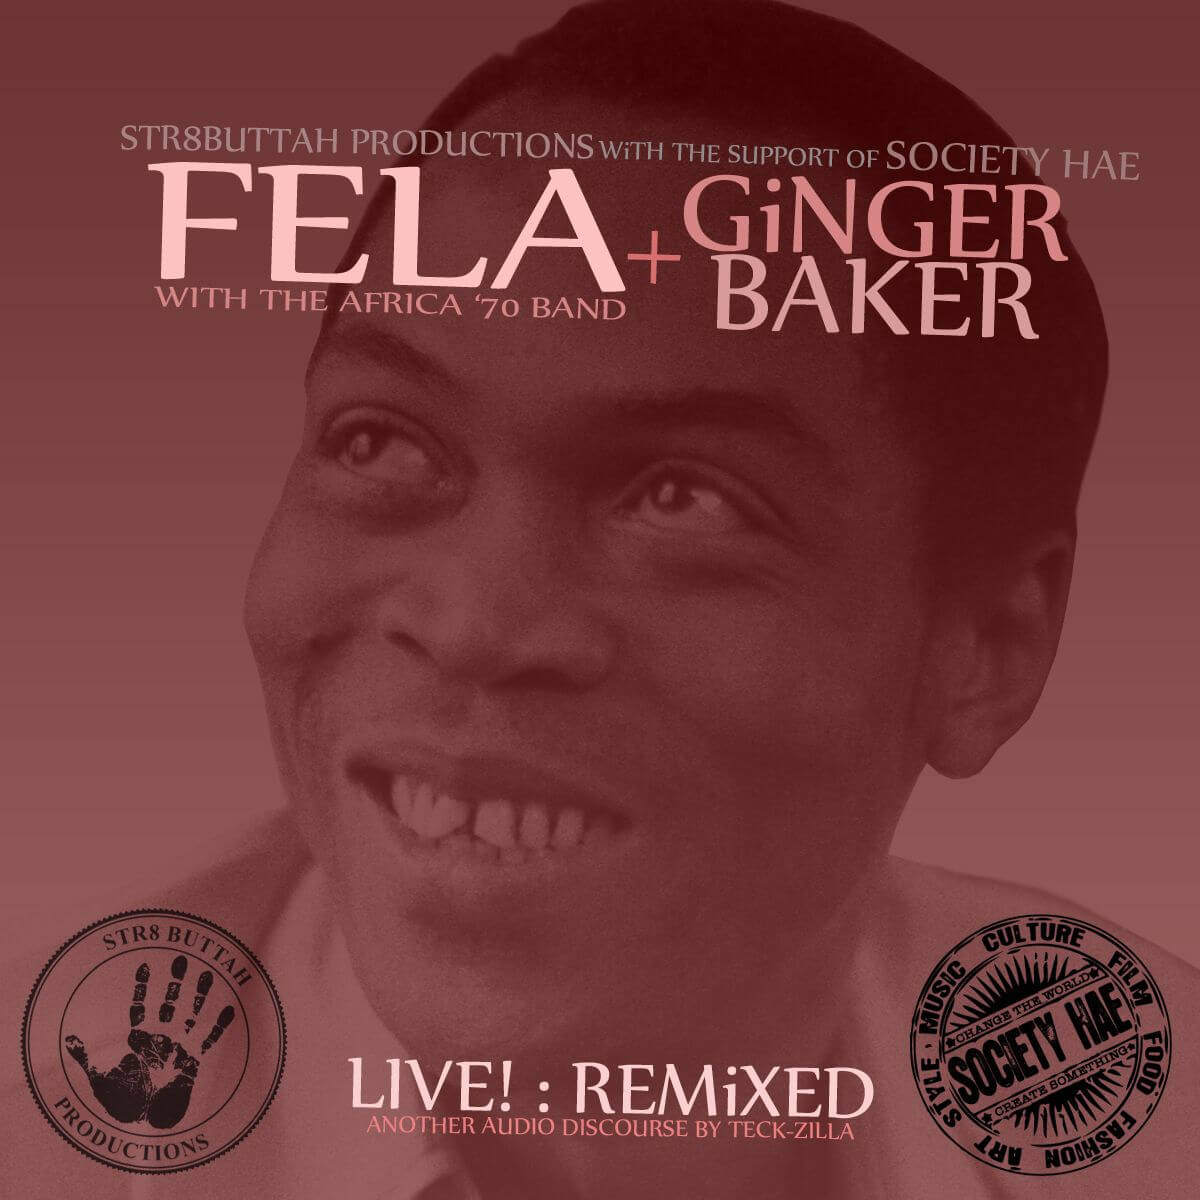 DOWNLOAD: Fela Kuti + Ginger Baker: LIVE! Remixed « tooXclusive